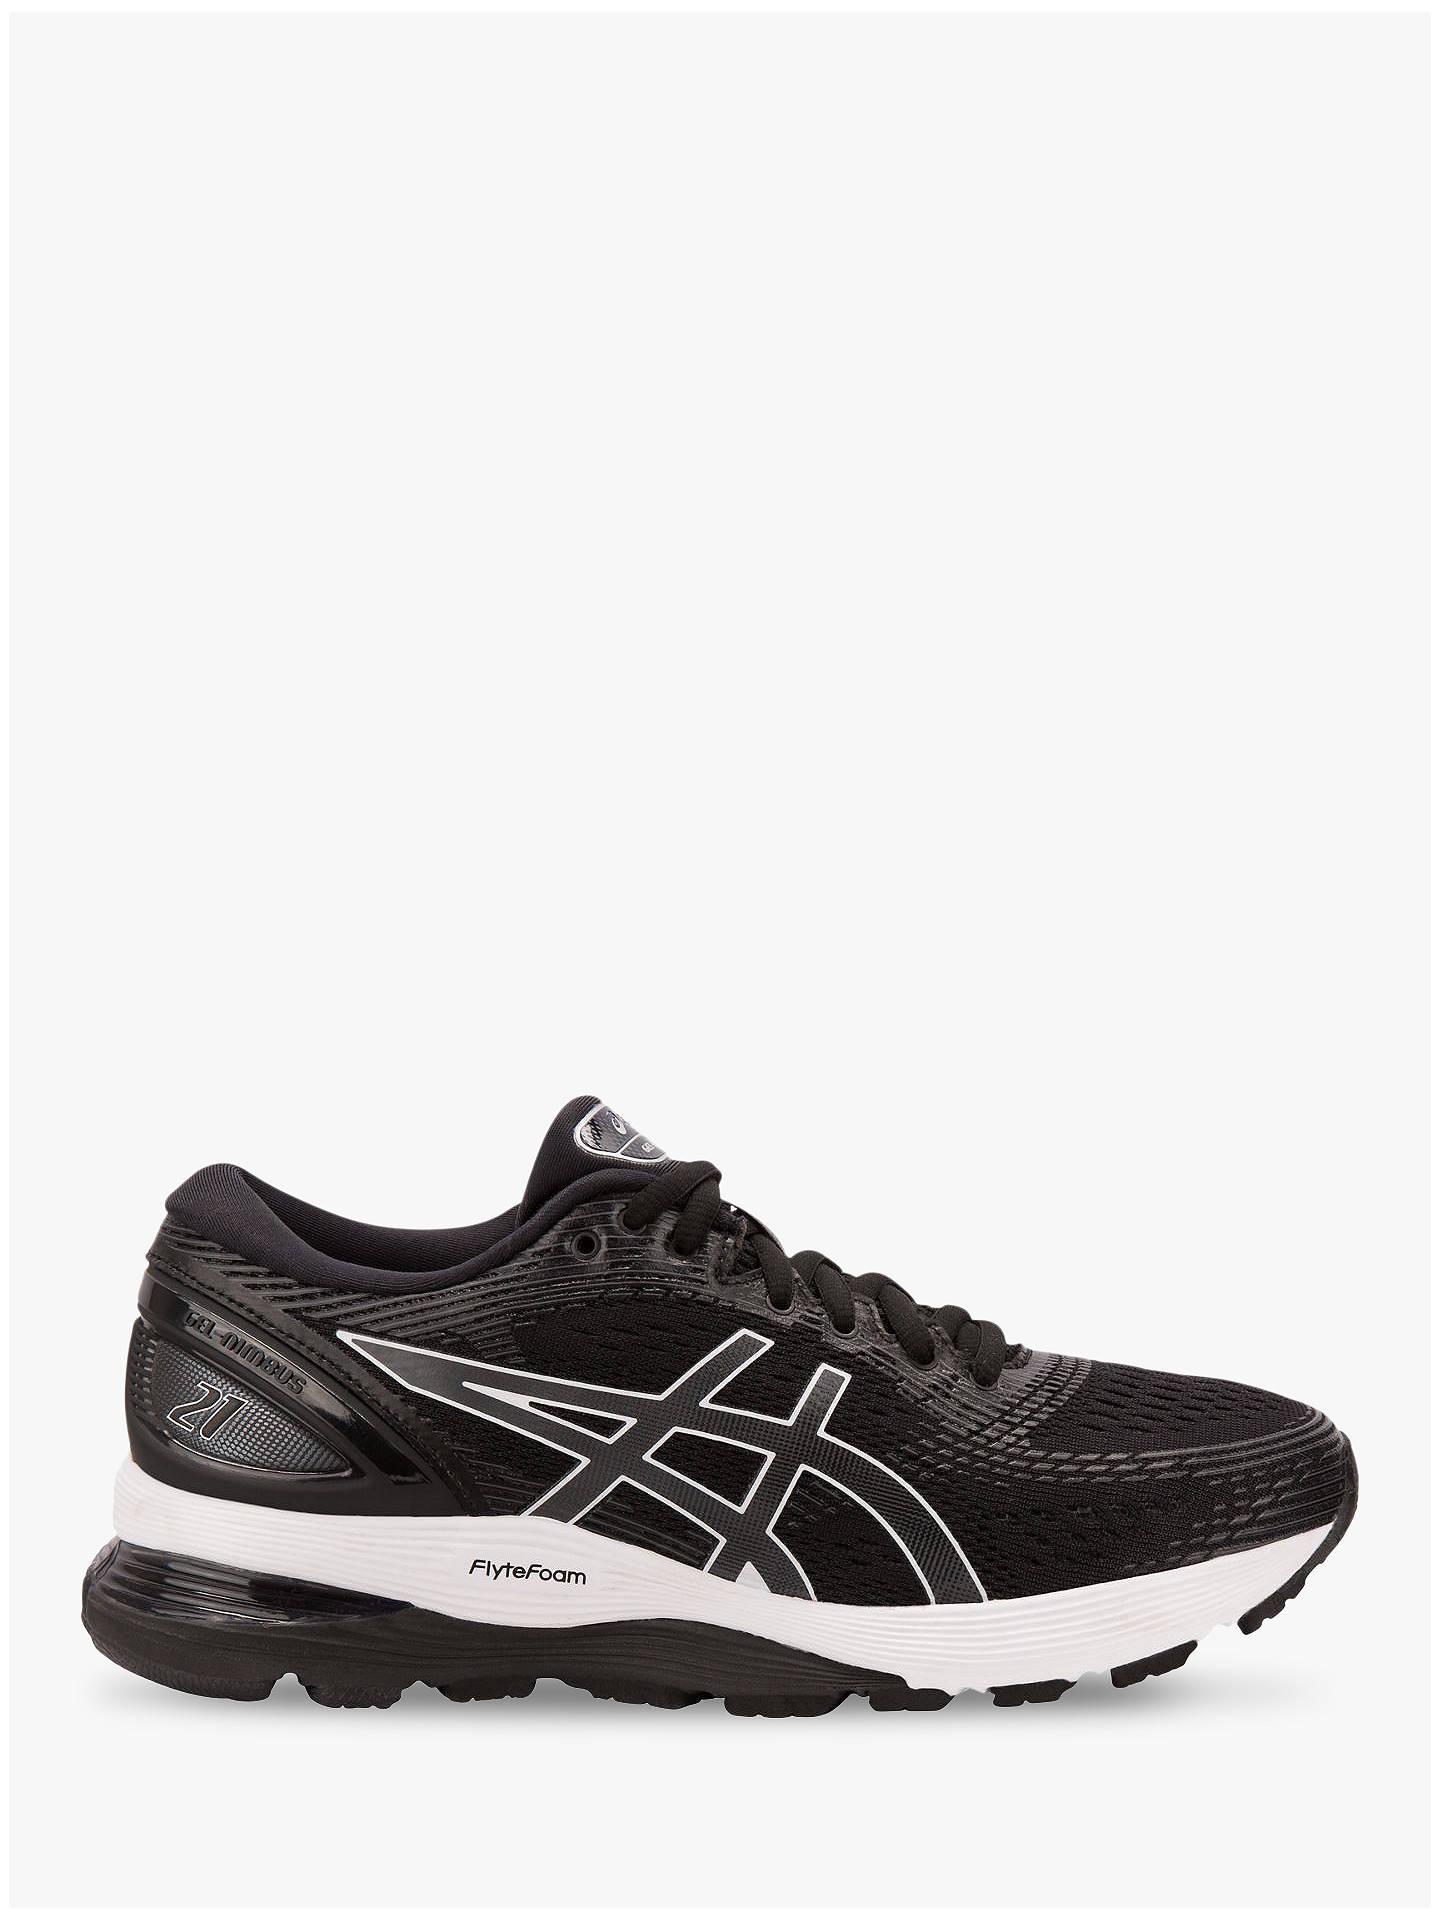 on sale 73e94 6a860 ASICS GEL-NIMBUS 21 Women's Running Shoes, Black/Dark Grey